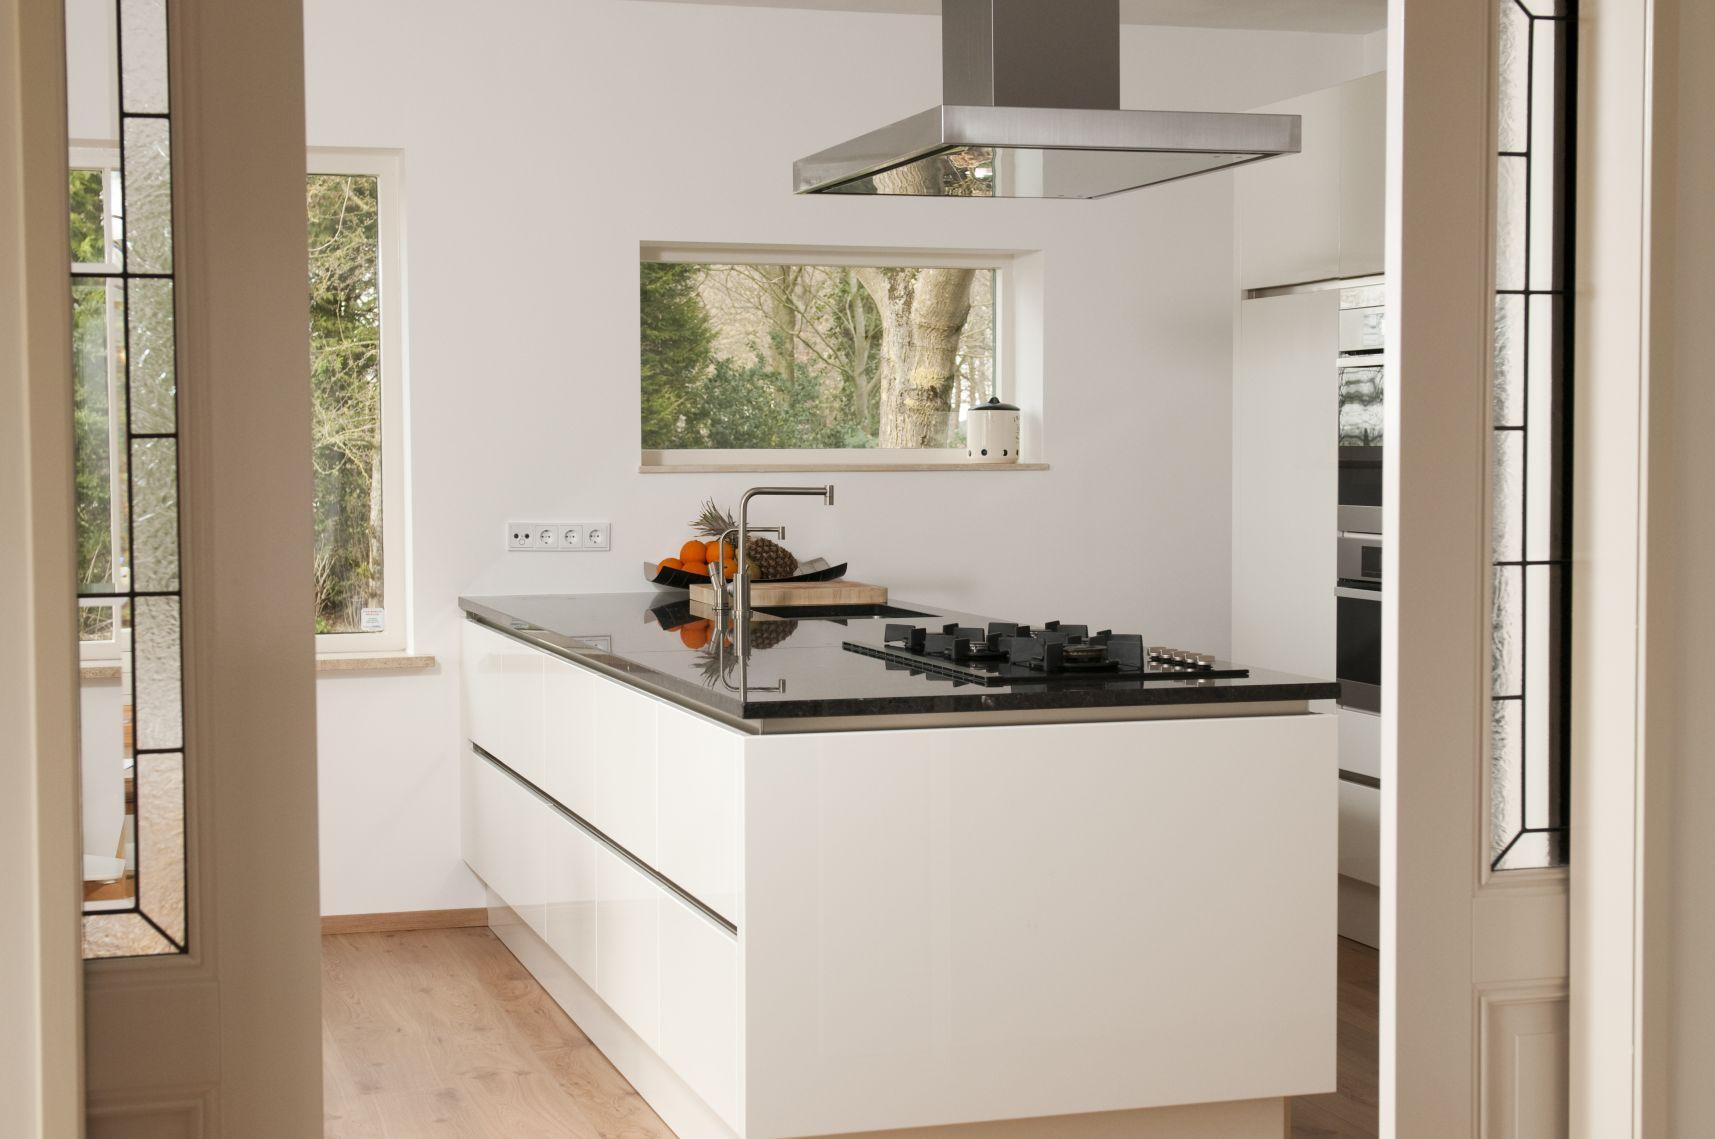 ... idea 20 : Mooie witte moderne design keuken met keukeneiland keukens